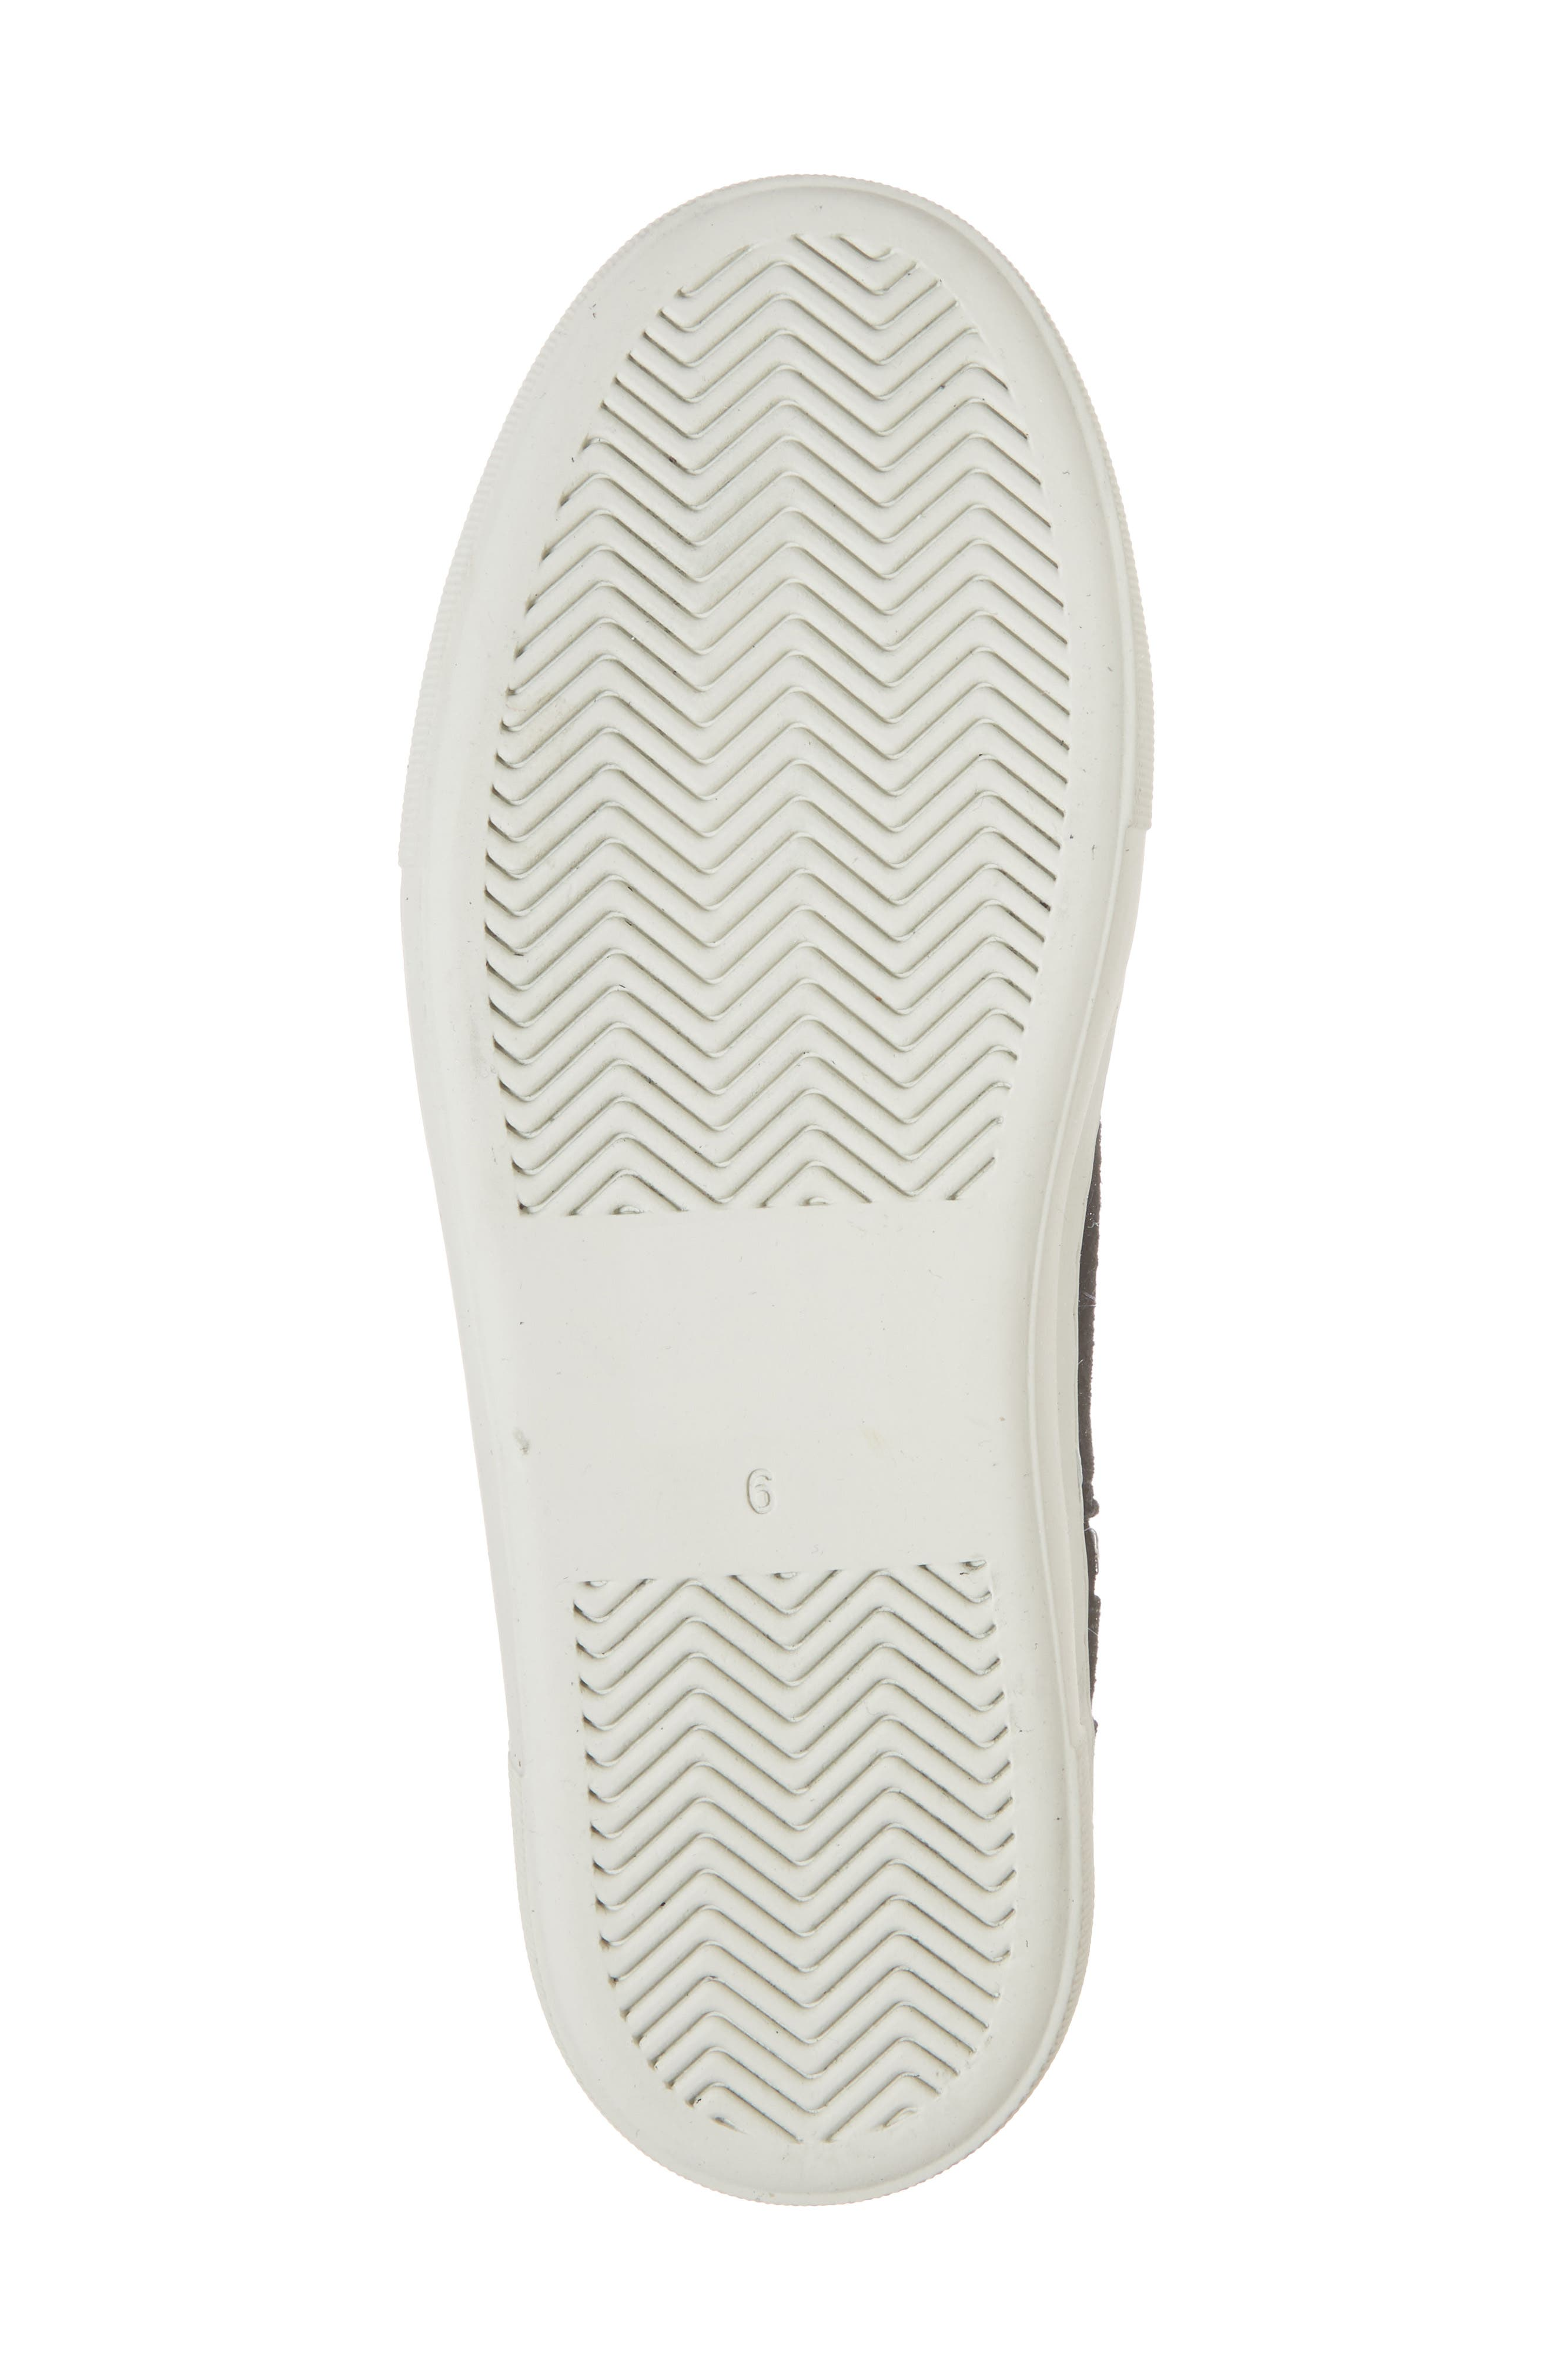 Garrson Sneaker Boot,                             Alternate thumbnail 6, color,                             006